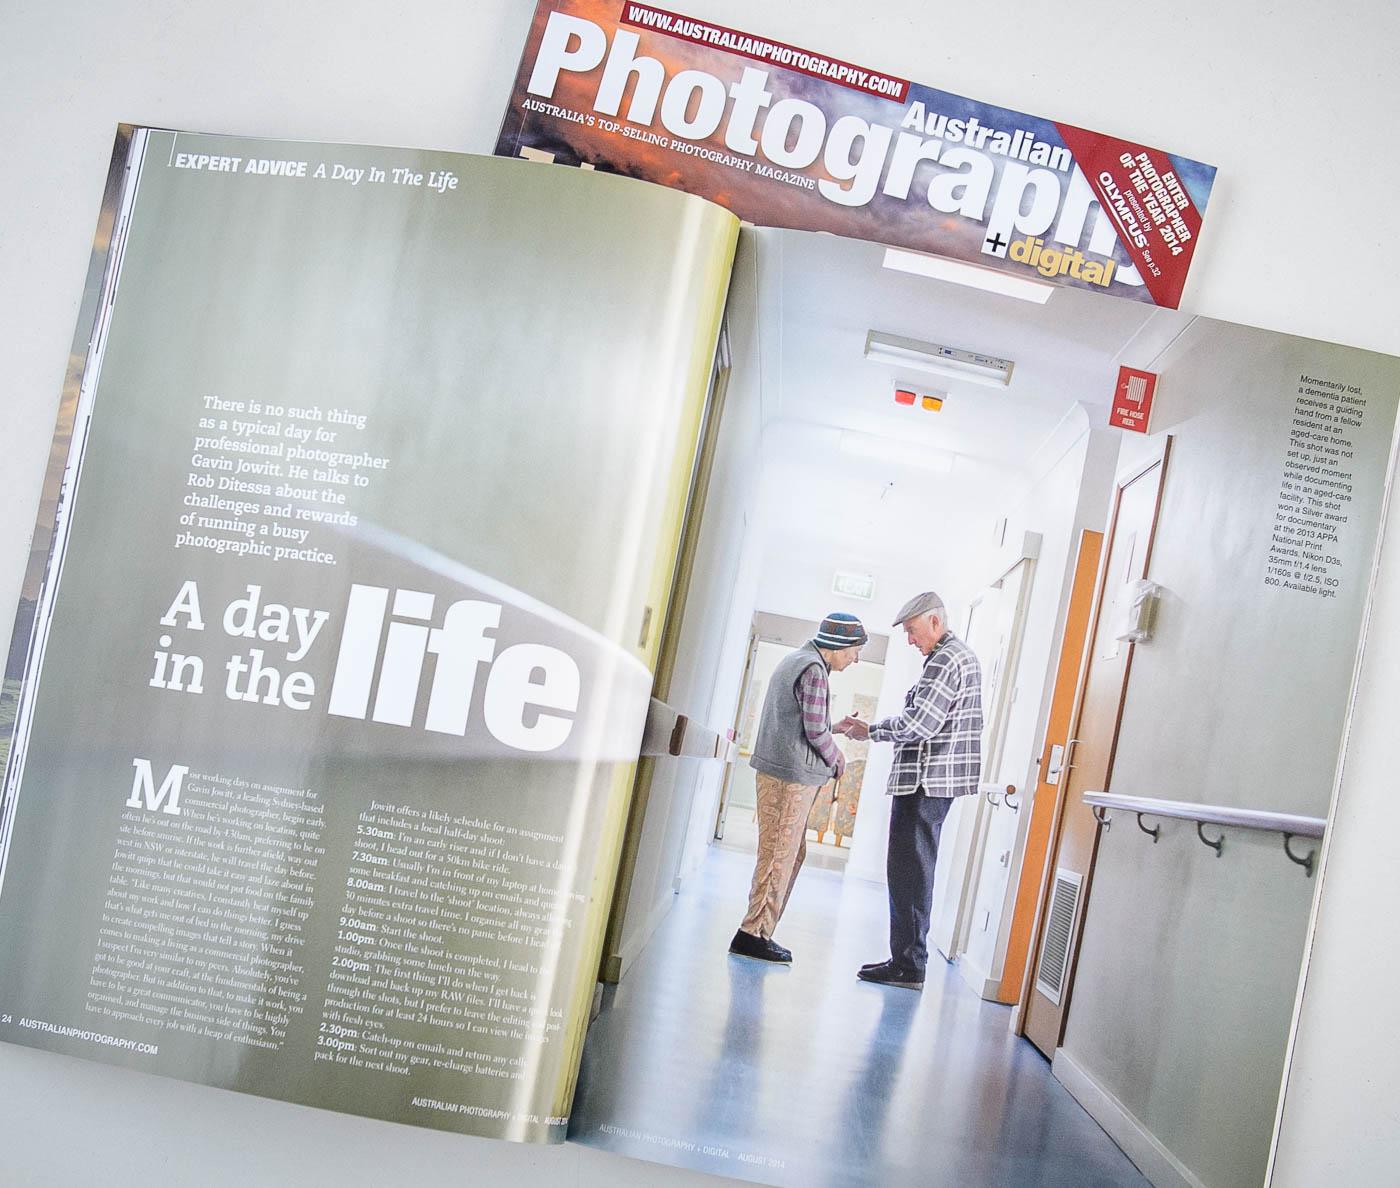 Australian Photography Magazine article